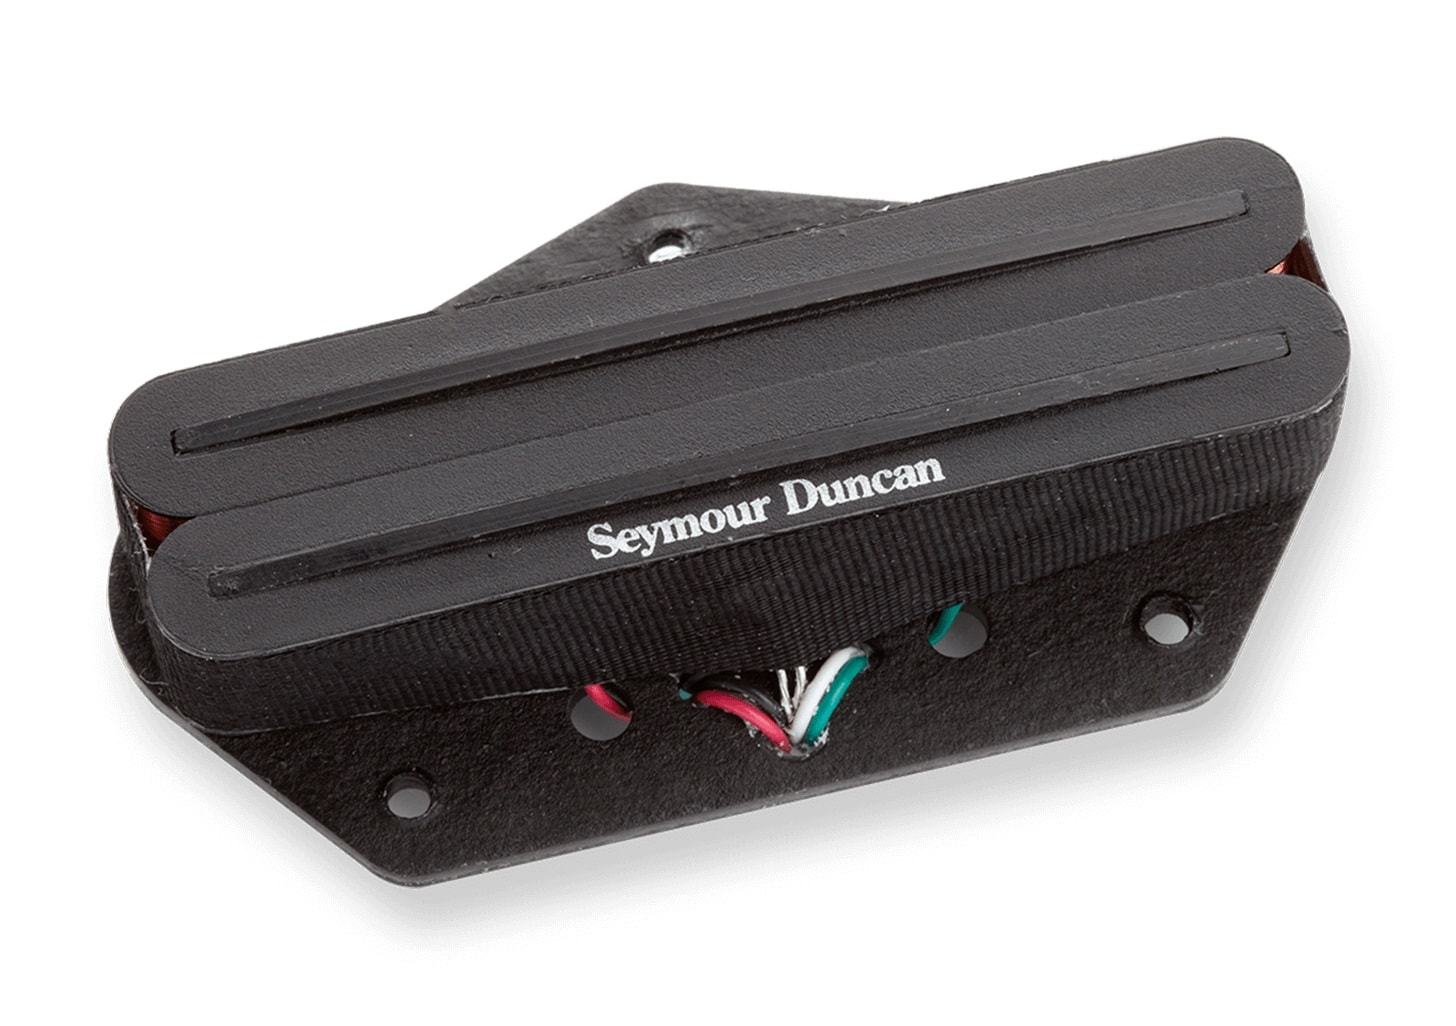 Seymour Duncan Pickup Wiring Seymour Duncan Wiring Schematics Seymour